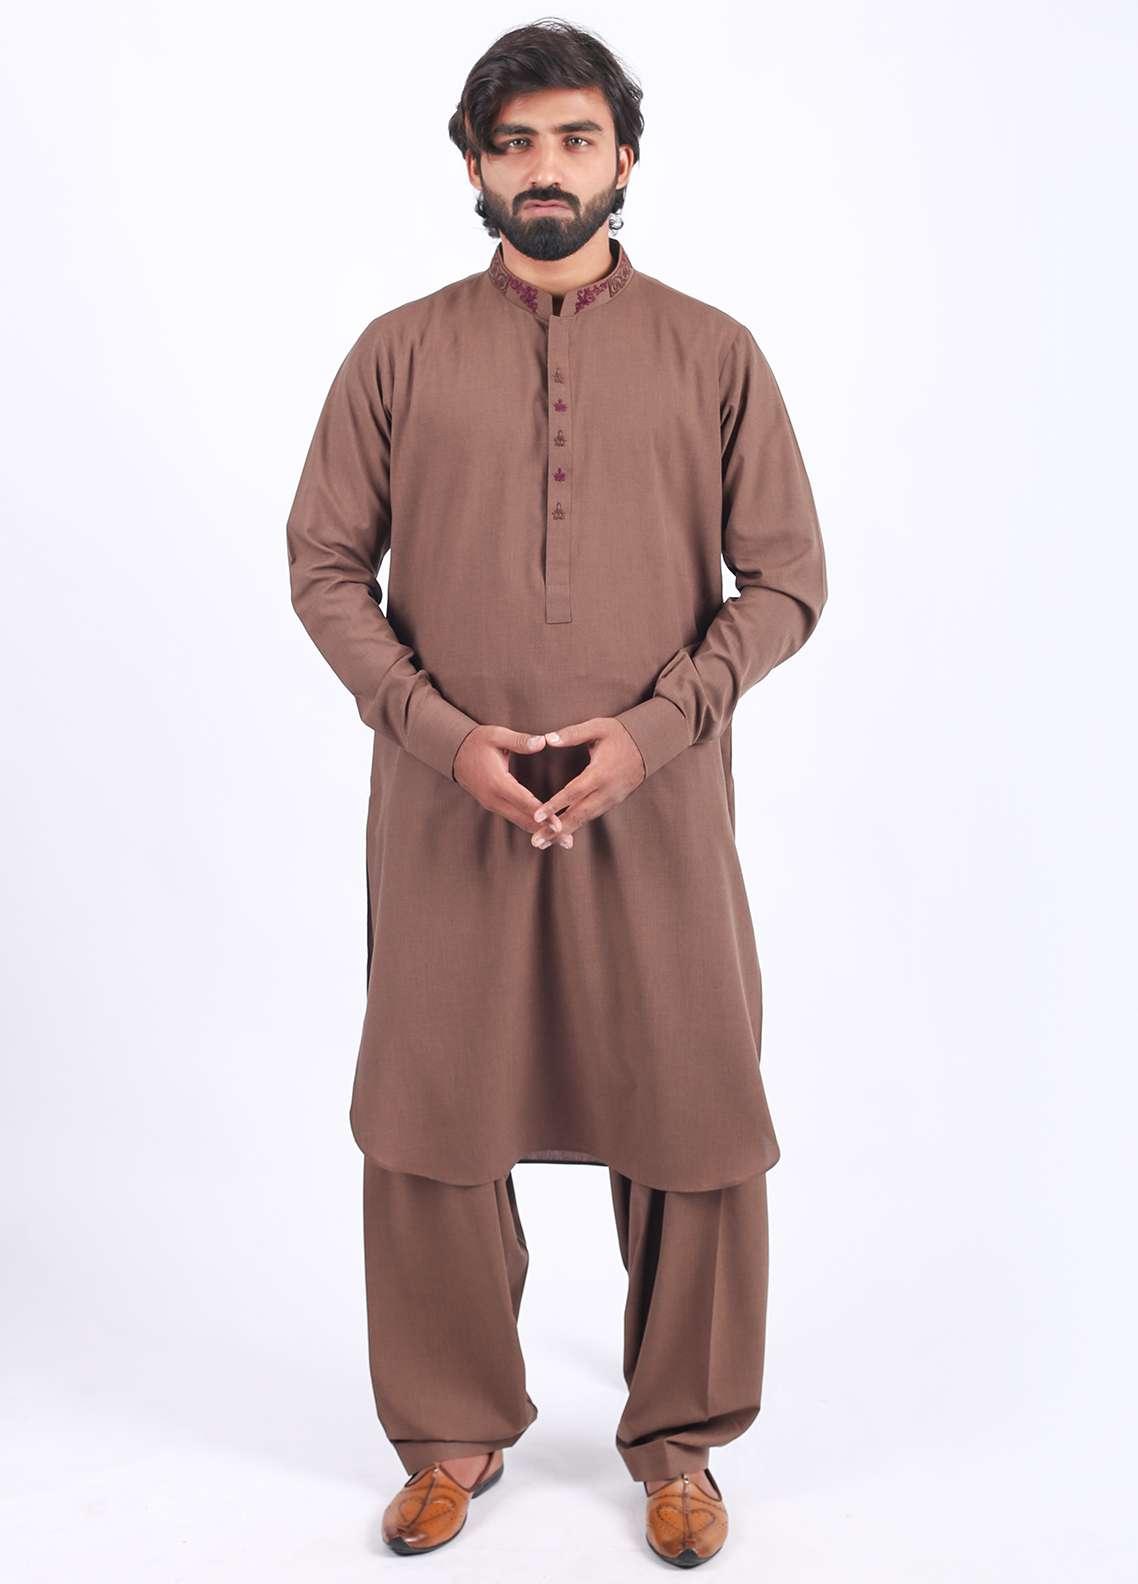 Aizaz Zafar Wash N Wear Embroidered Shalwar Kameez for Men - Brown AZ18M 019